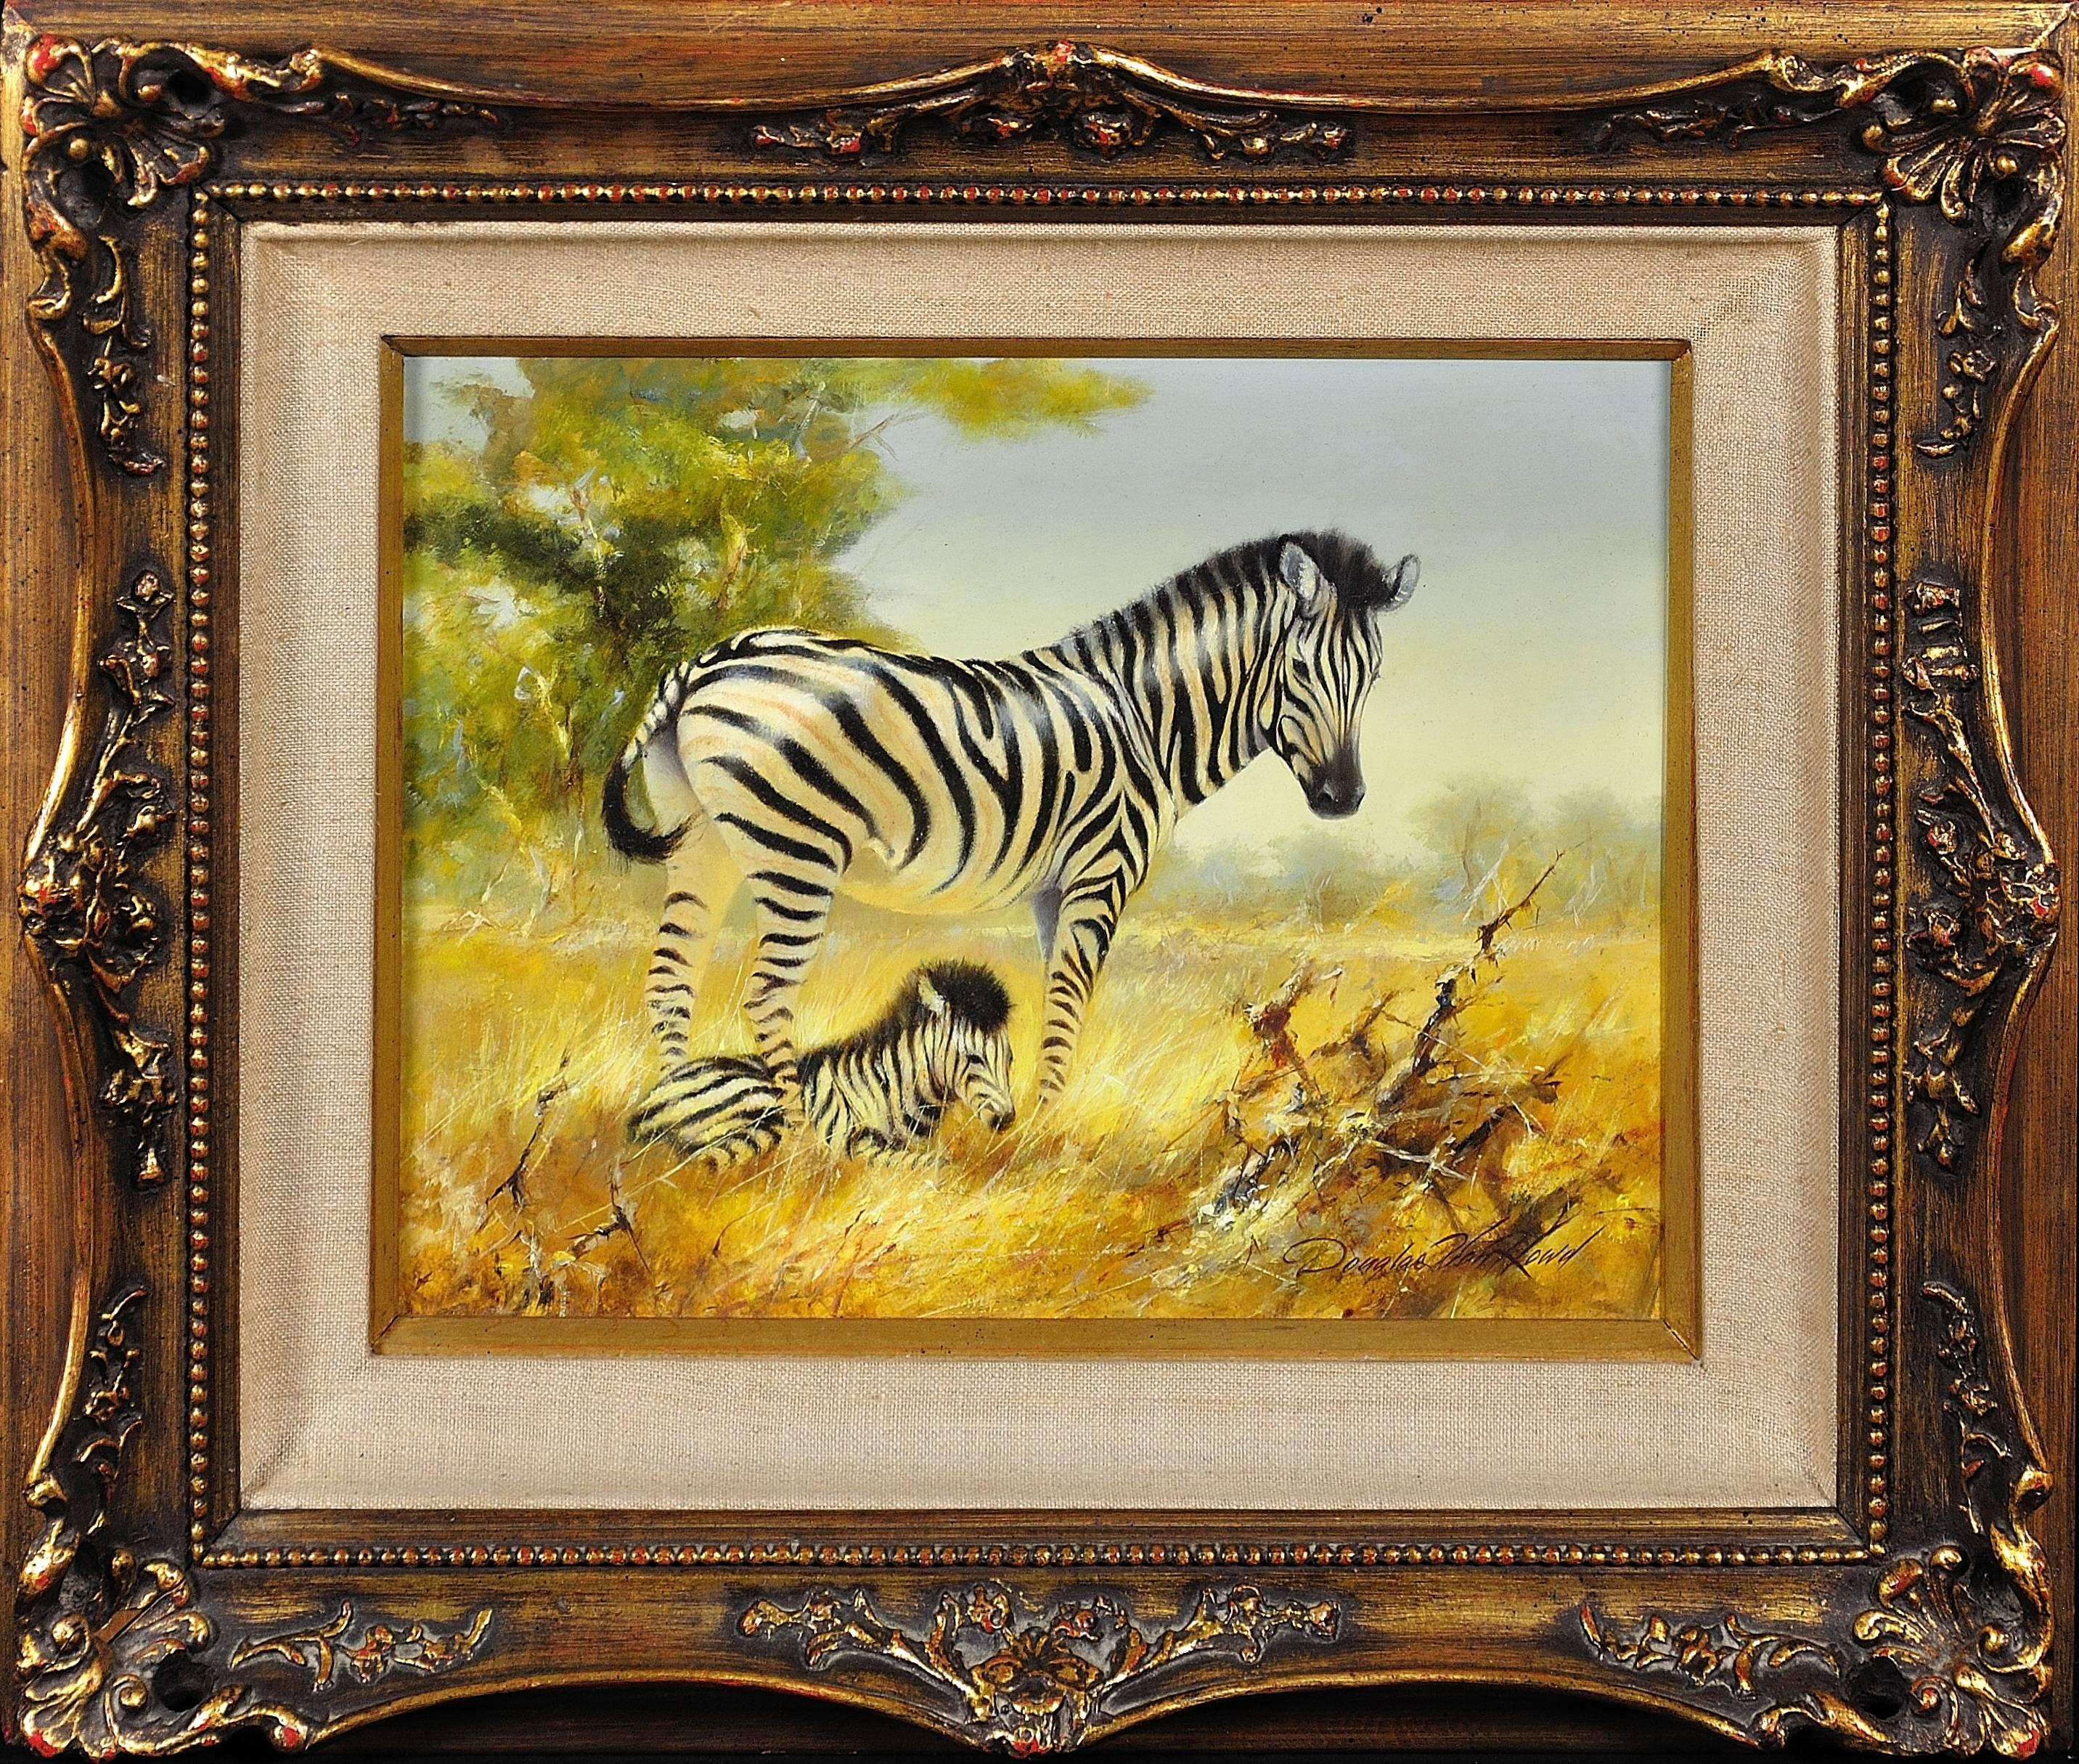 Zebra Mare and Foal. African Wildlife Scene.Safari.Animal. Original Oil Painting